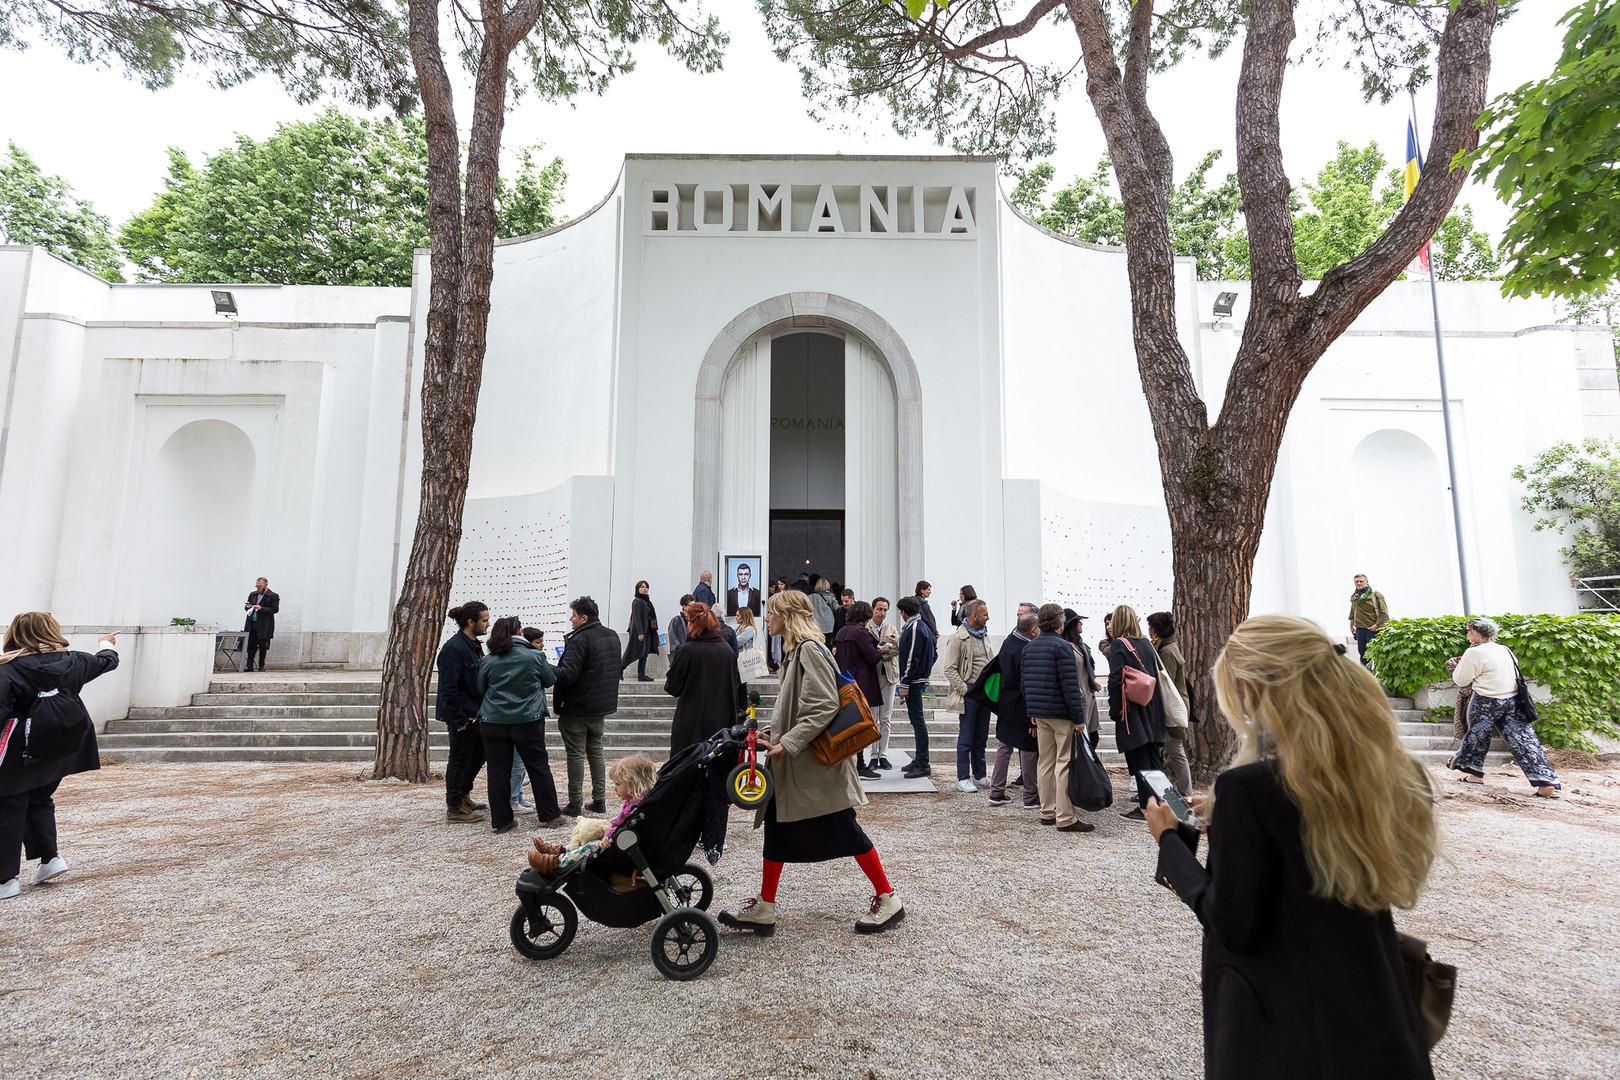 Romania at Biennale Arte 2019